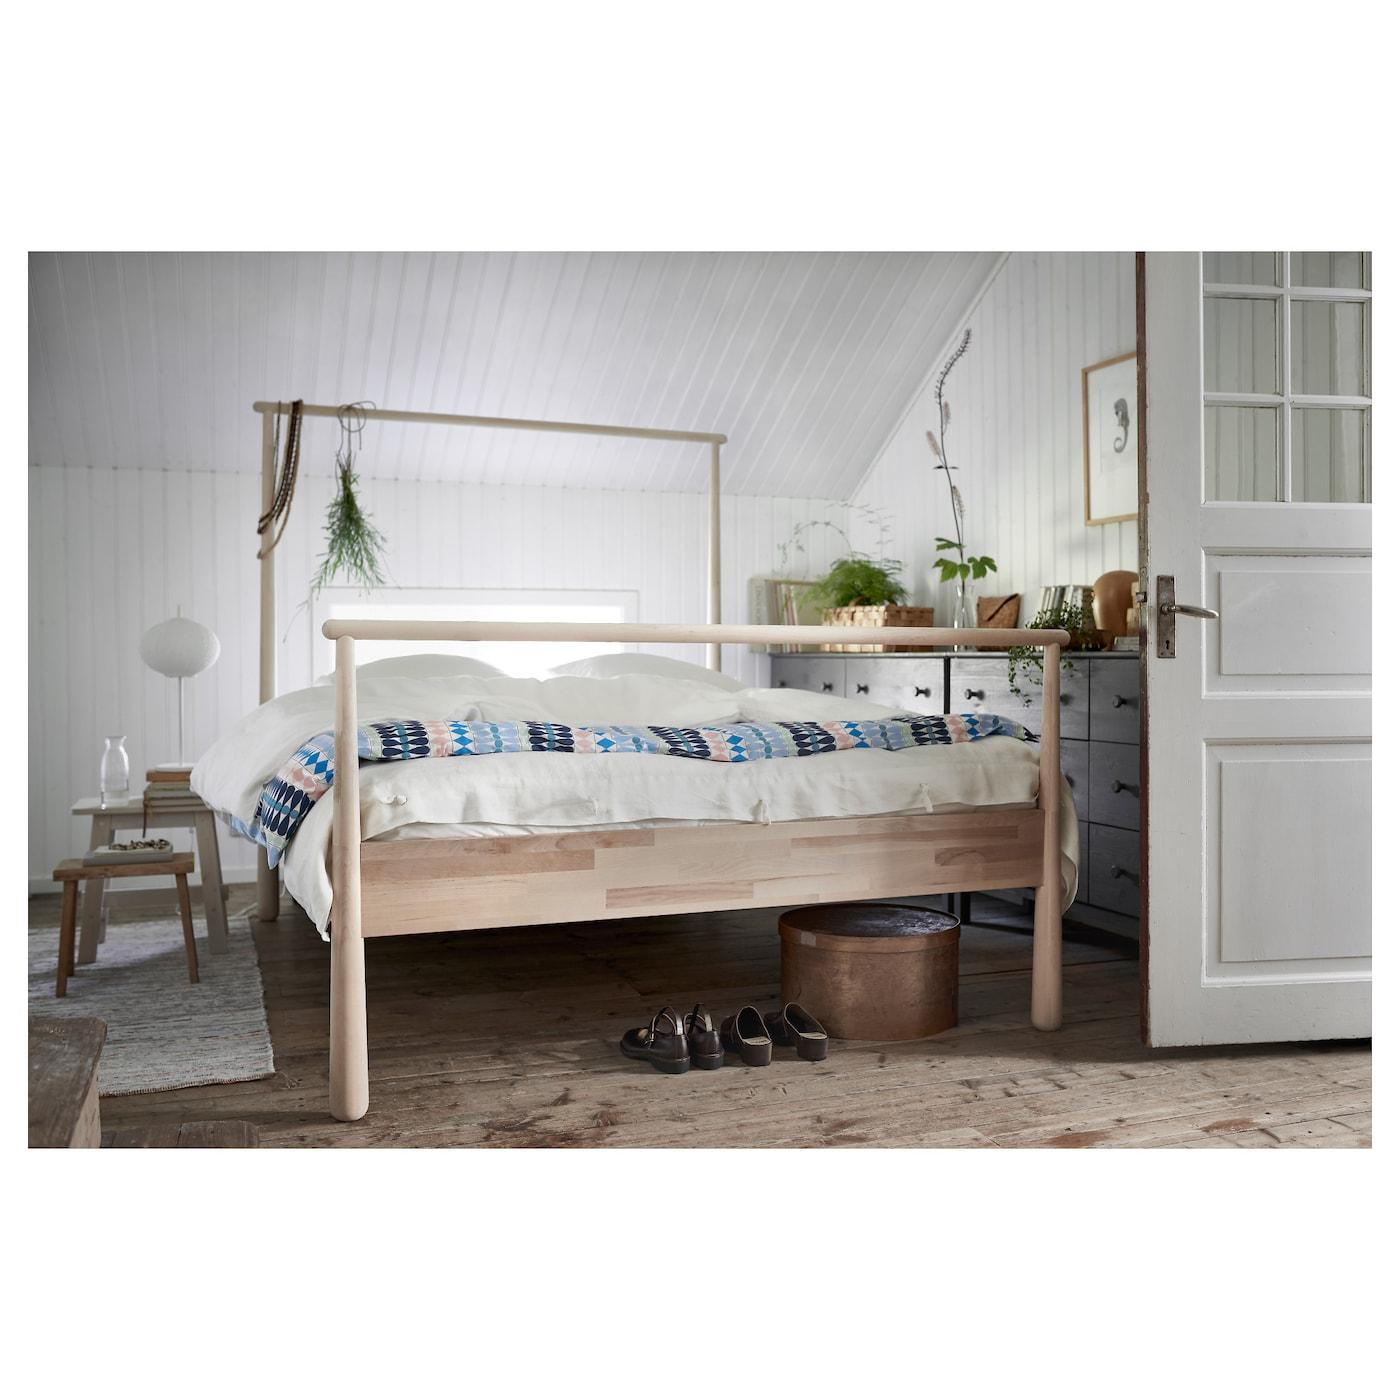 GJ–RA Bed frame Birch lönset Standard King IKEA